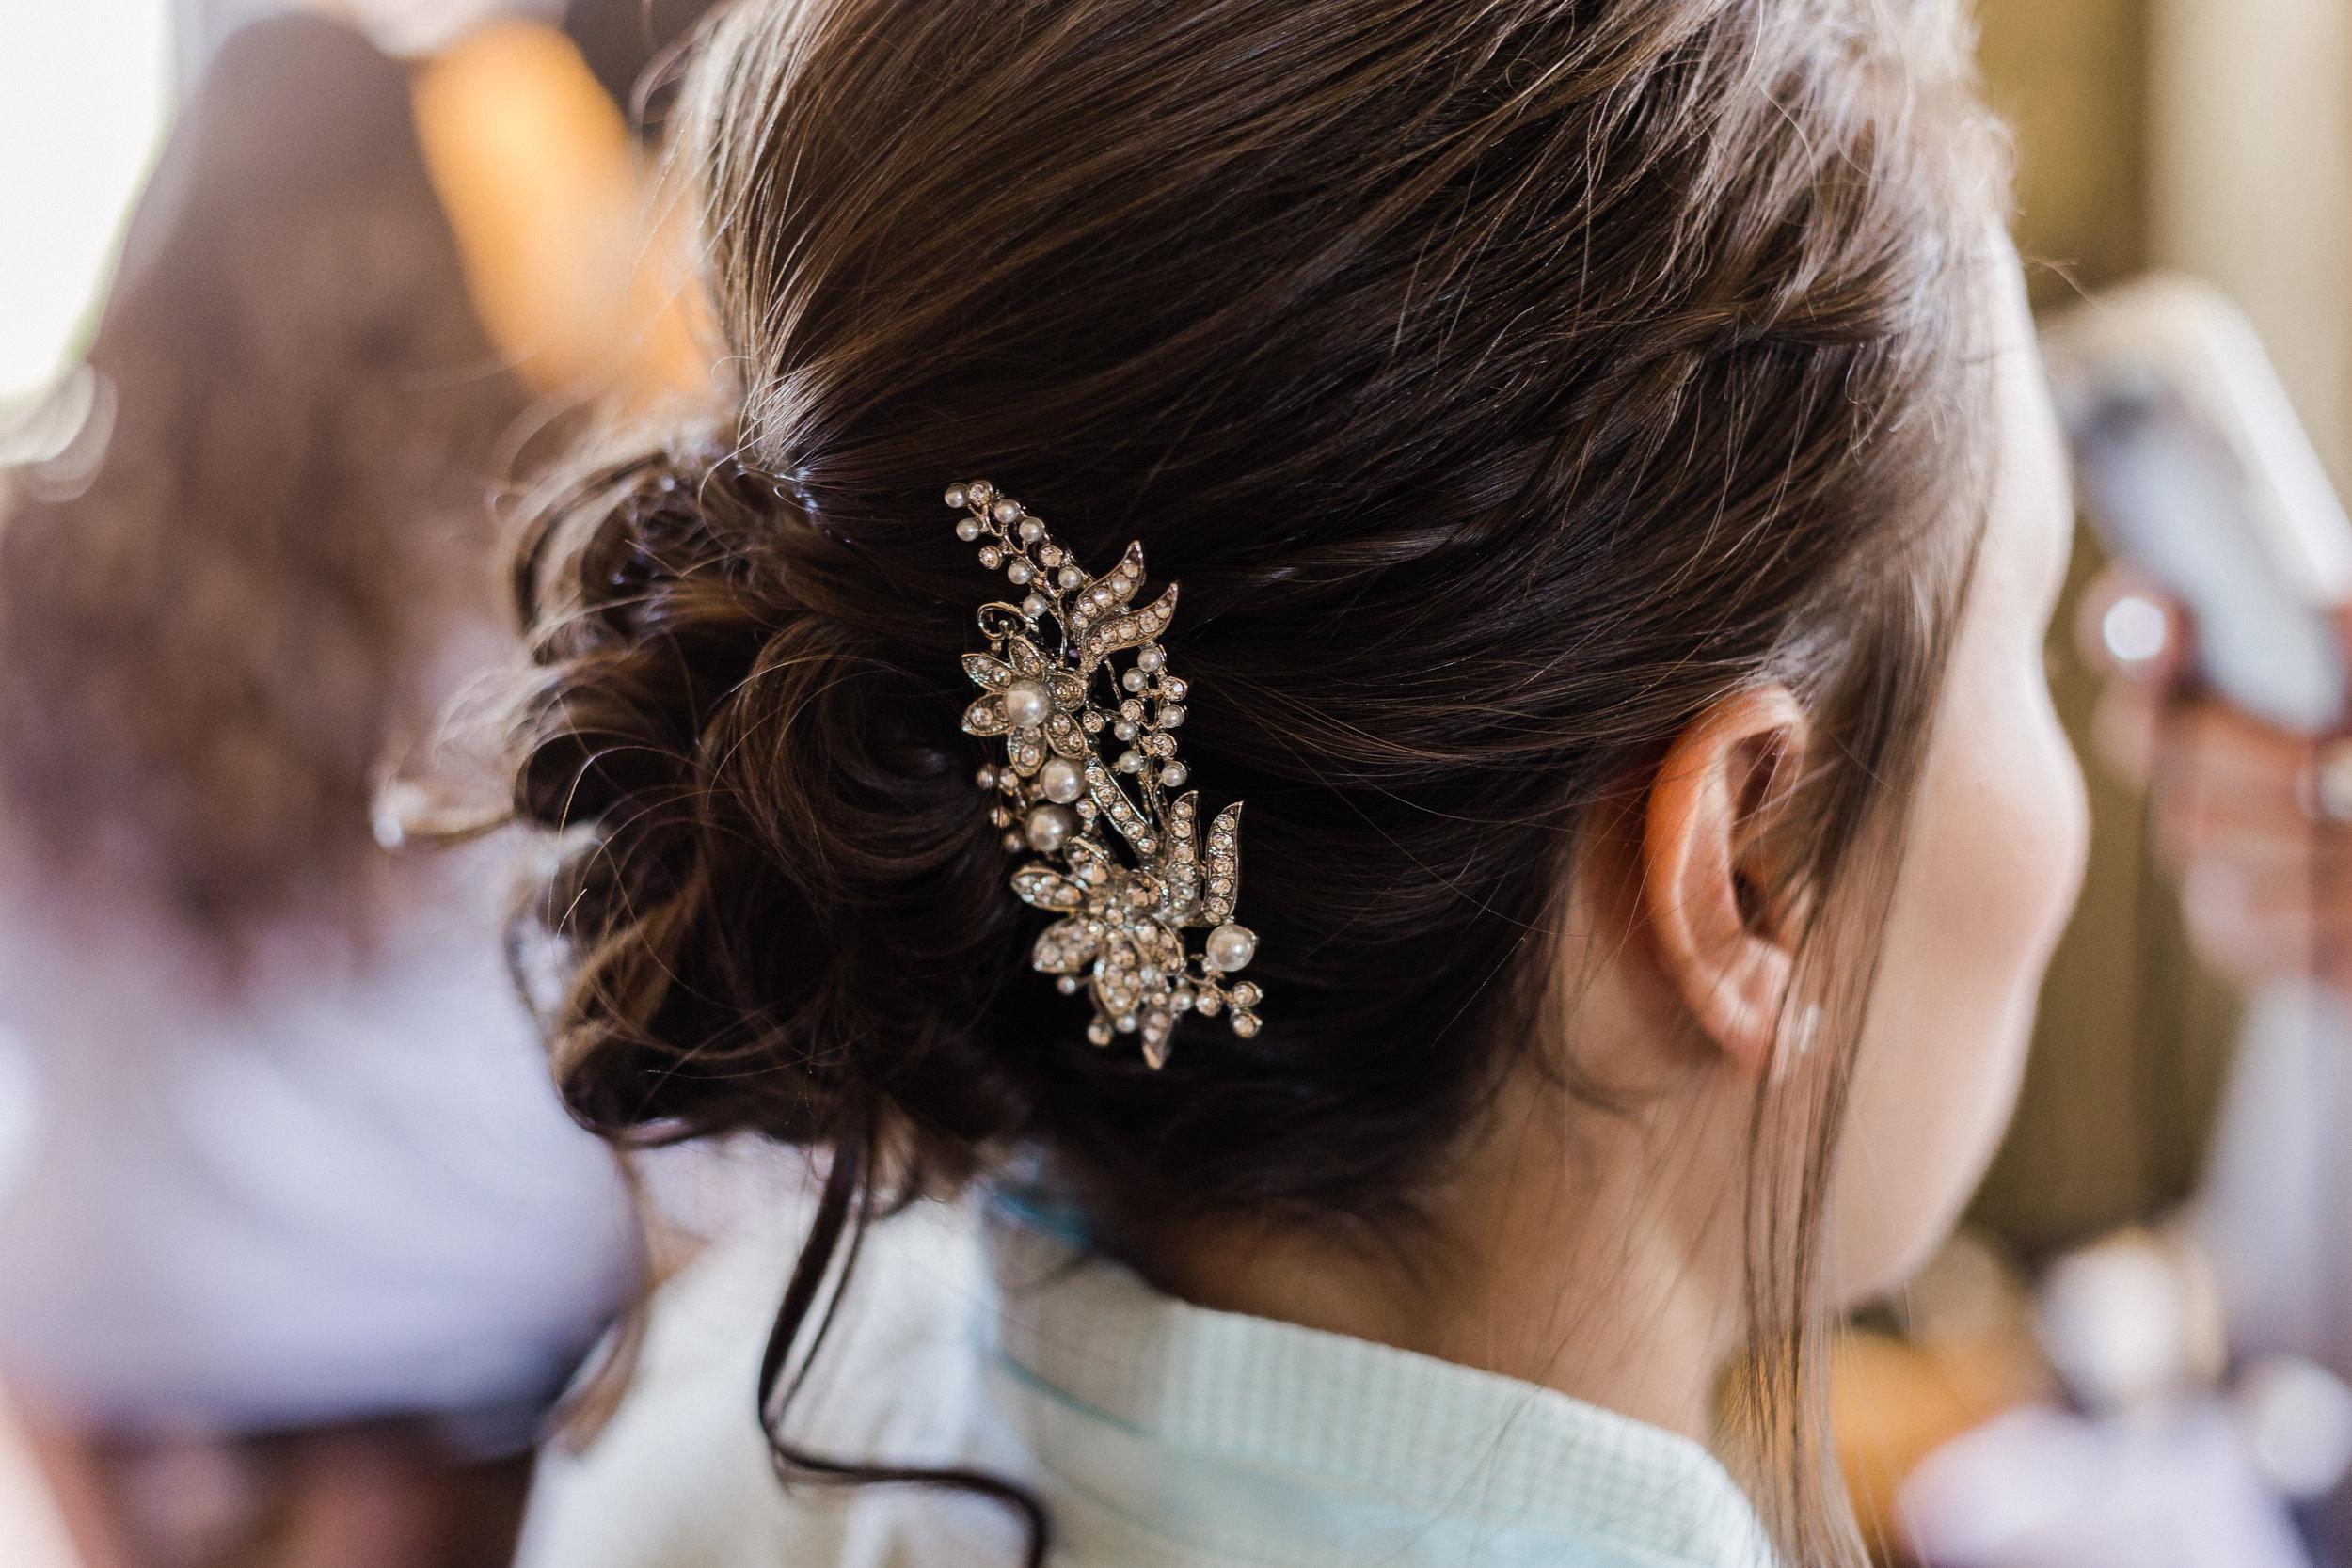 Denver-wedding-hairstylist-Colorado-traveling-updo-specialist